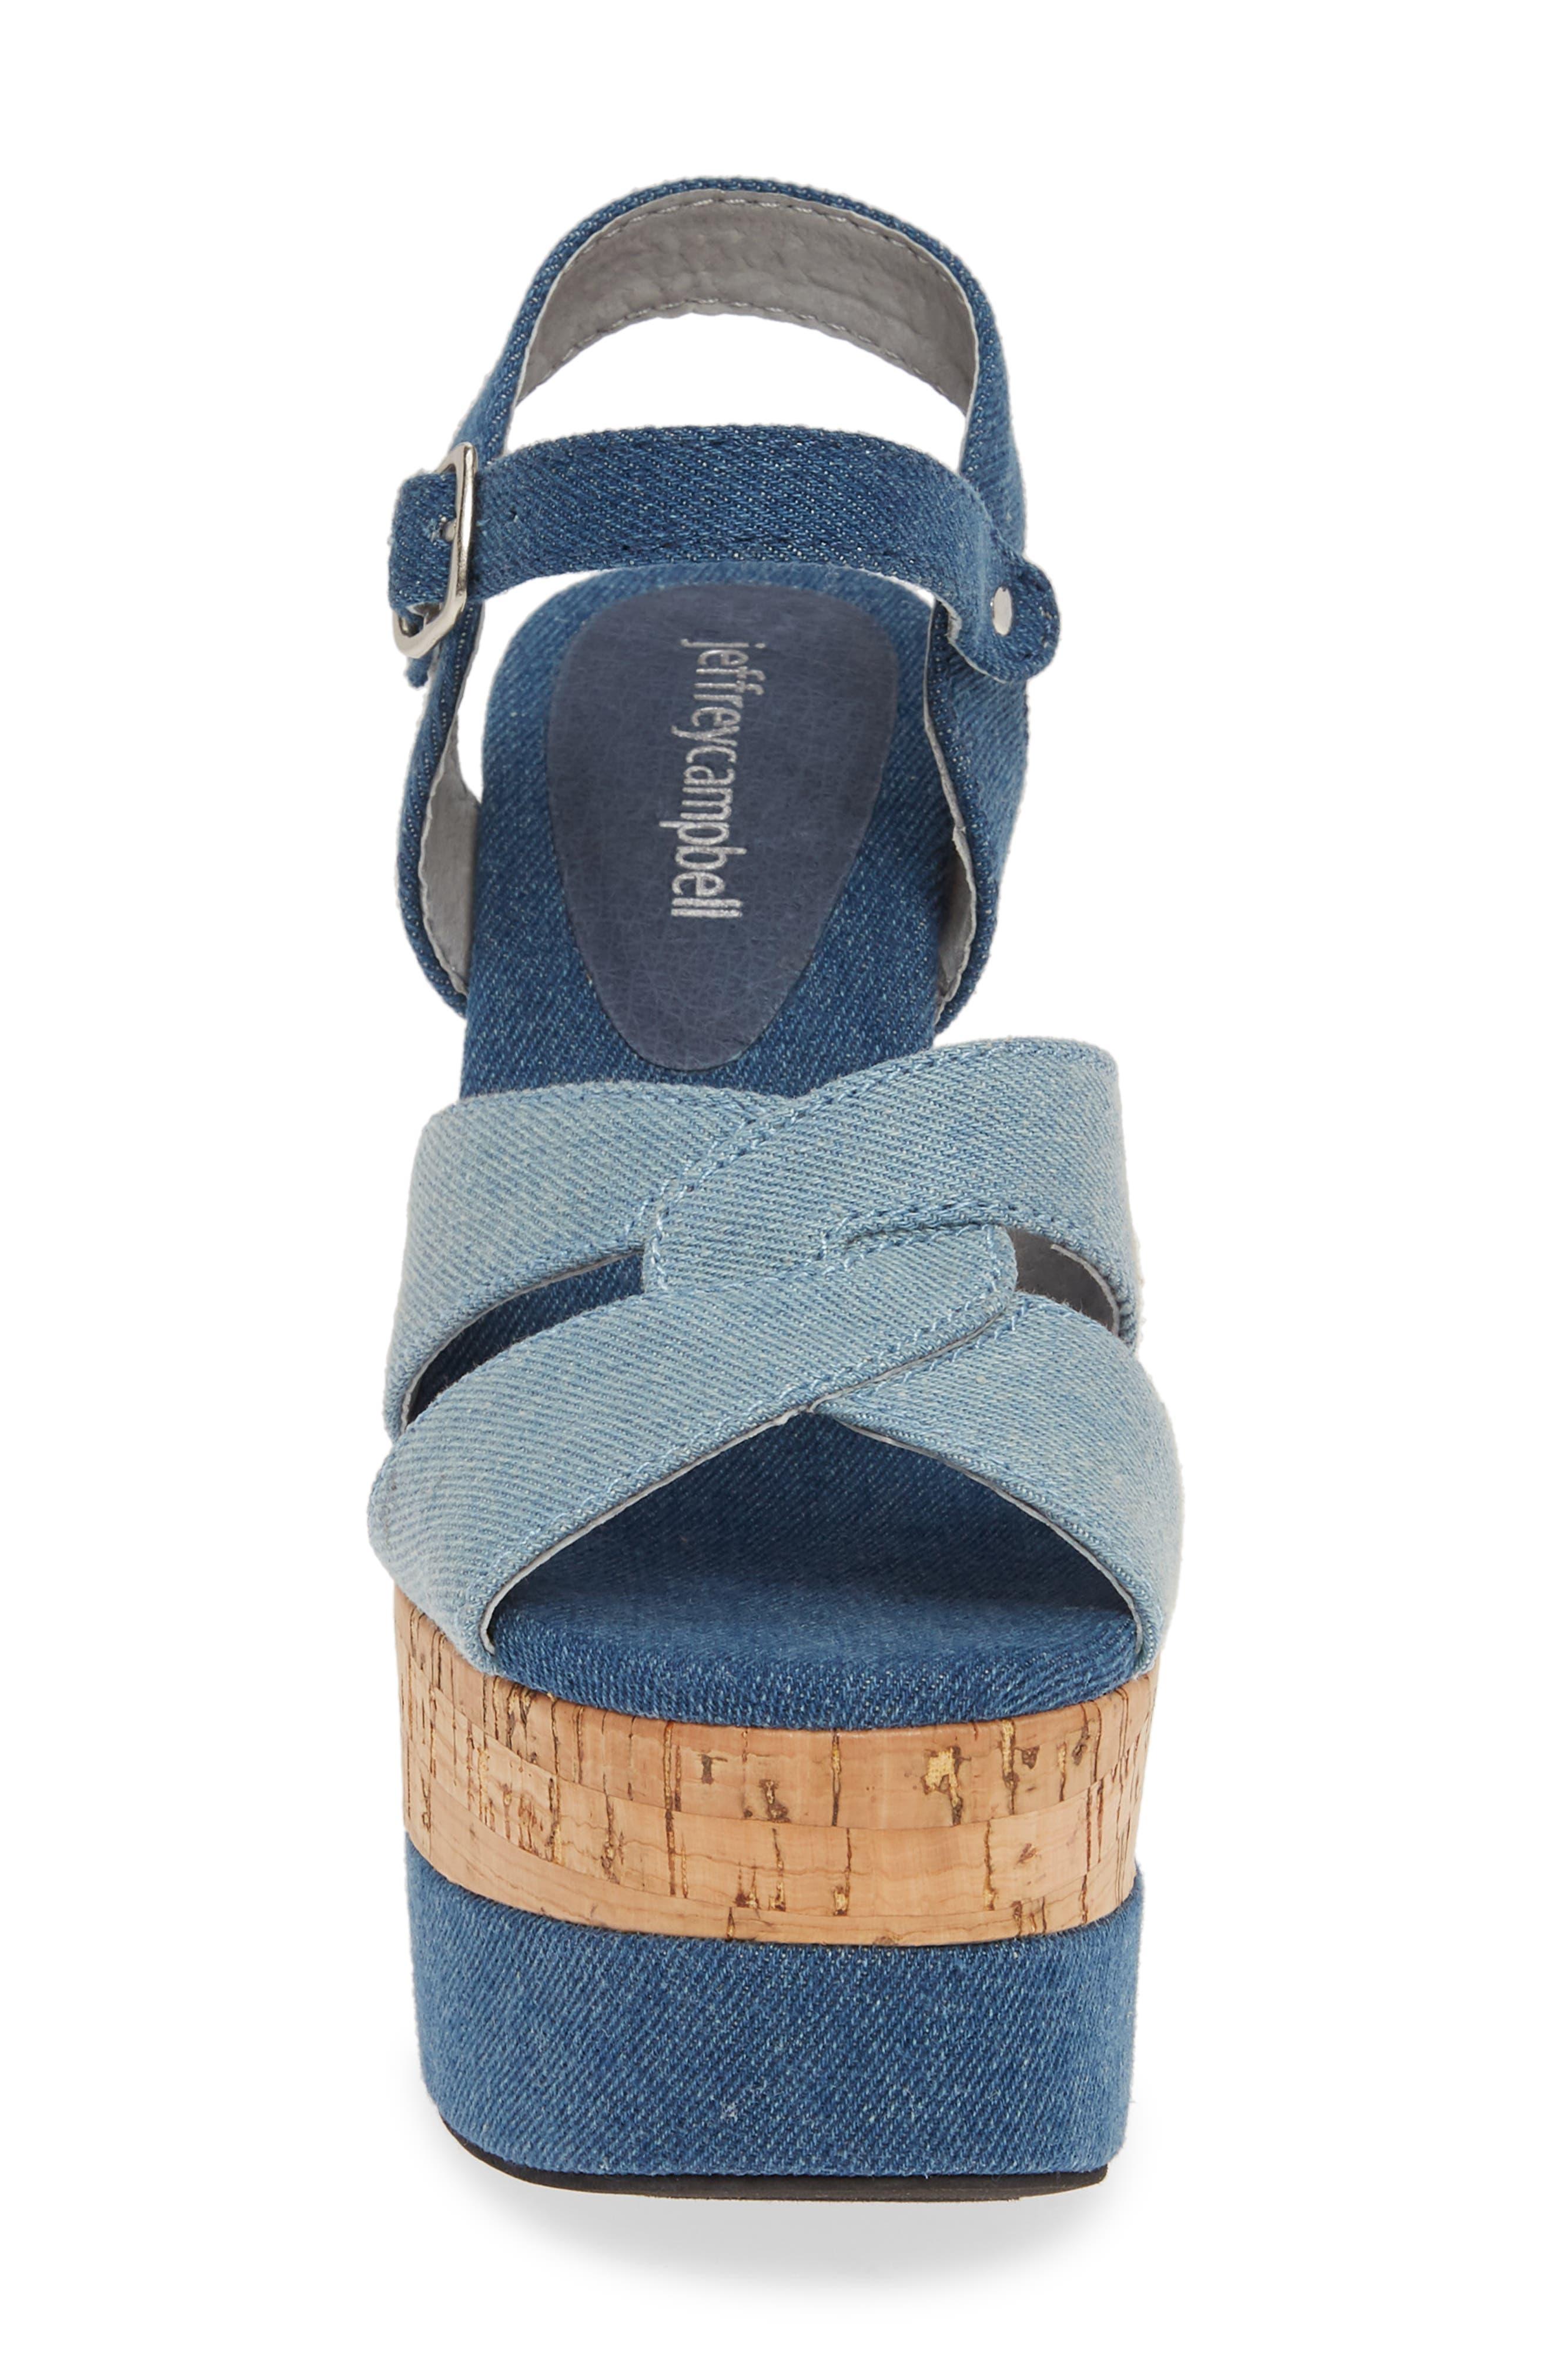 JEFFREY CAMPBELL, Wedge Platform Sandal, Alternate thumbnail 4, color, BLUE DENIM COMBO/ CORK